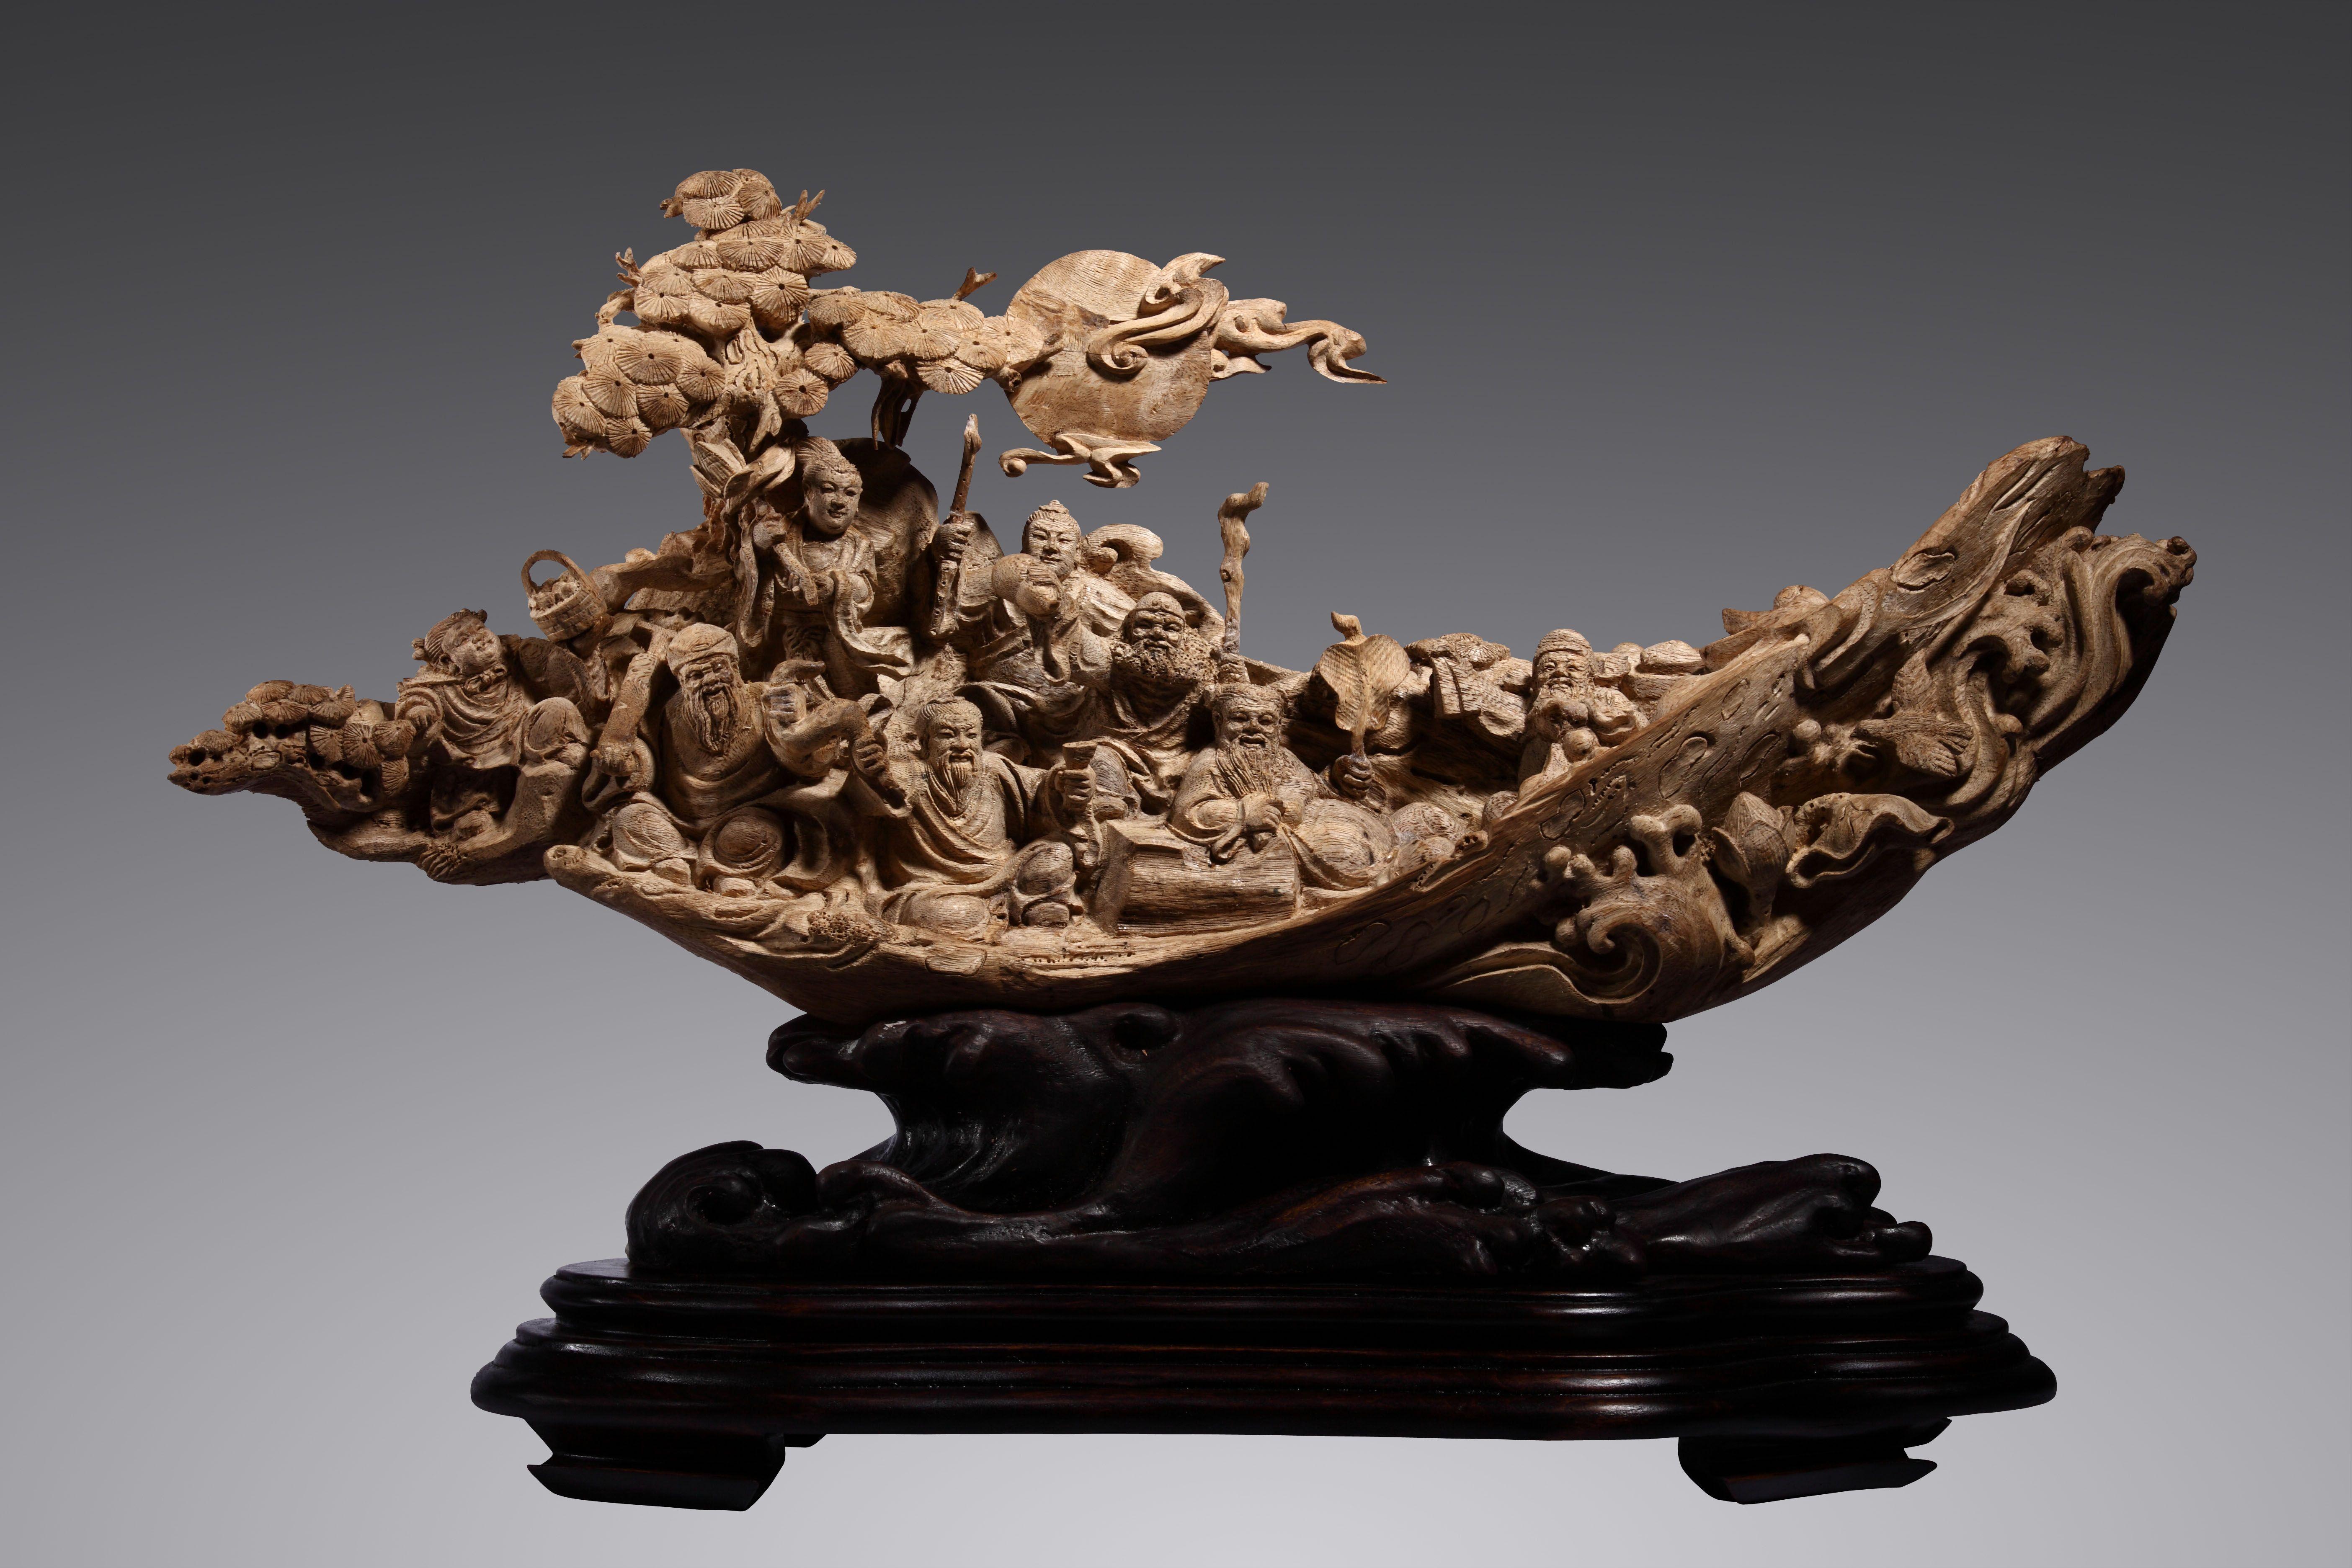 Agarwood and Agarwood Carving 沉香木雕 - Chinese Cool Art | Chinese